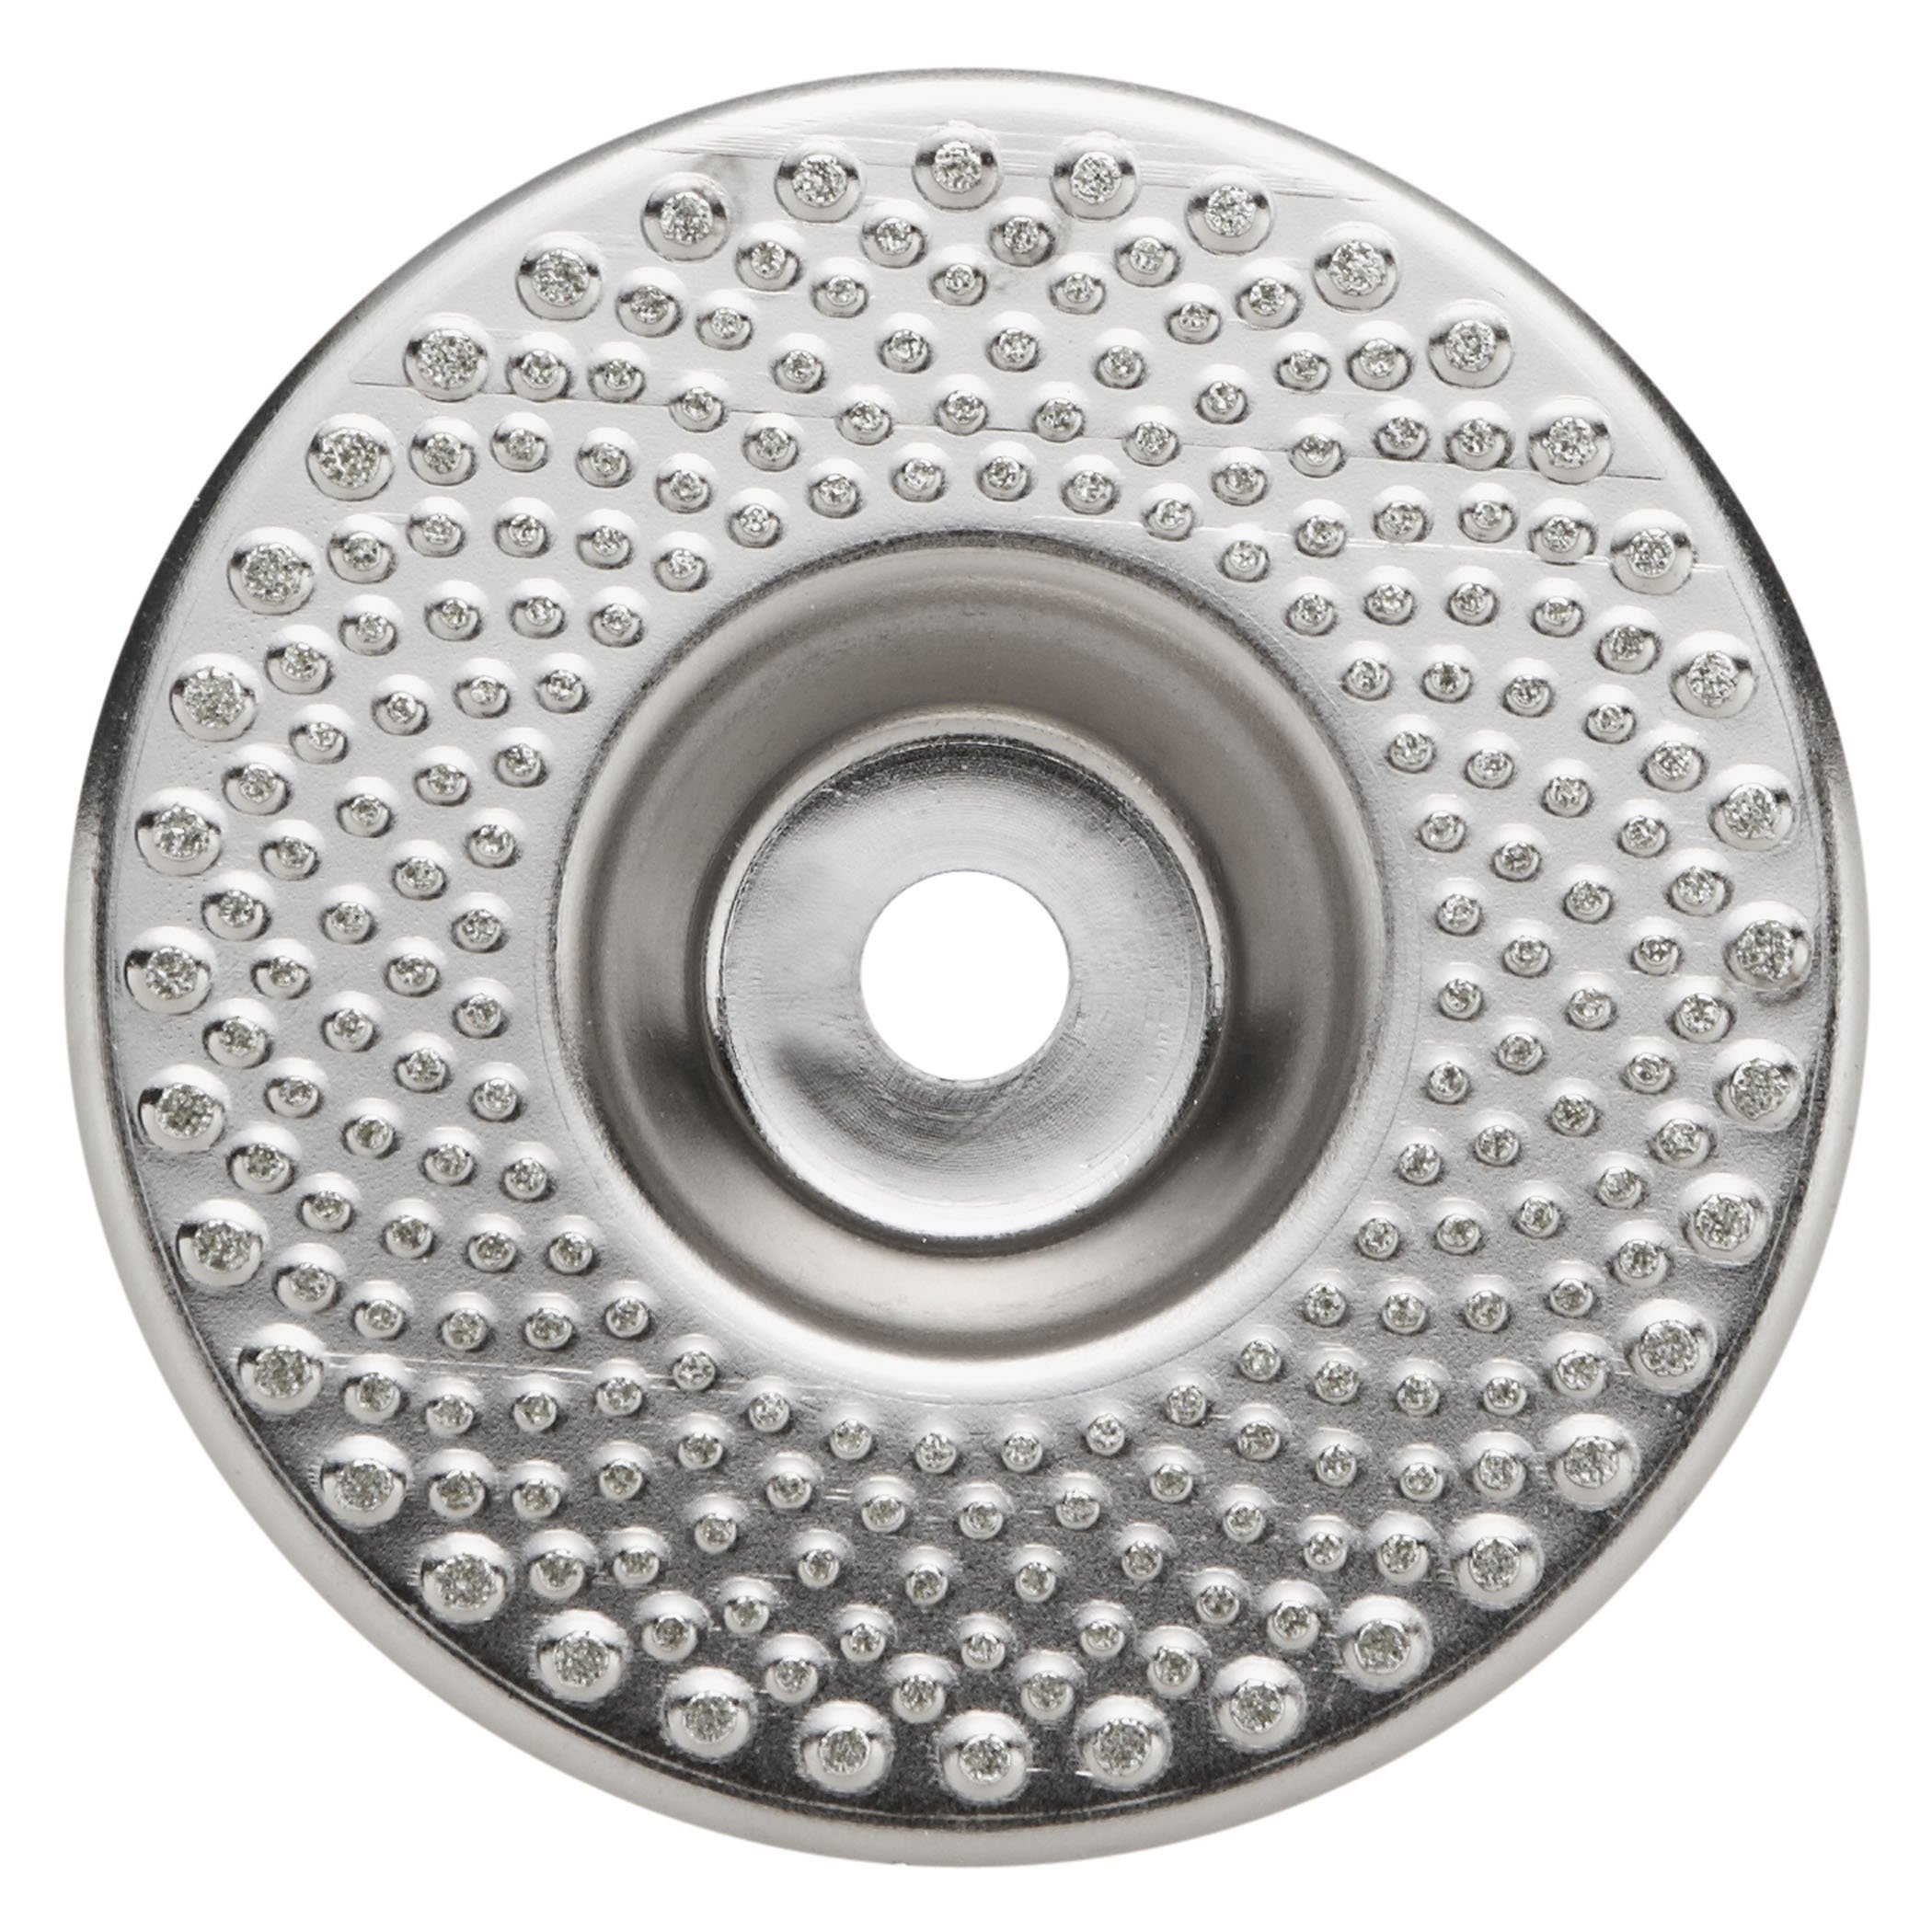 Dremel US410-01 Ultra-Saw 4-Inch Diamond Surface Prep Abrasive Wheel by Dremel (Image #1)